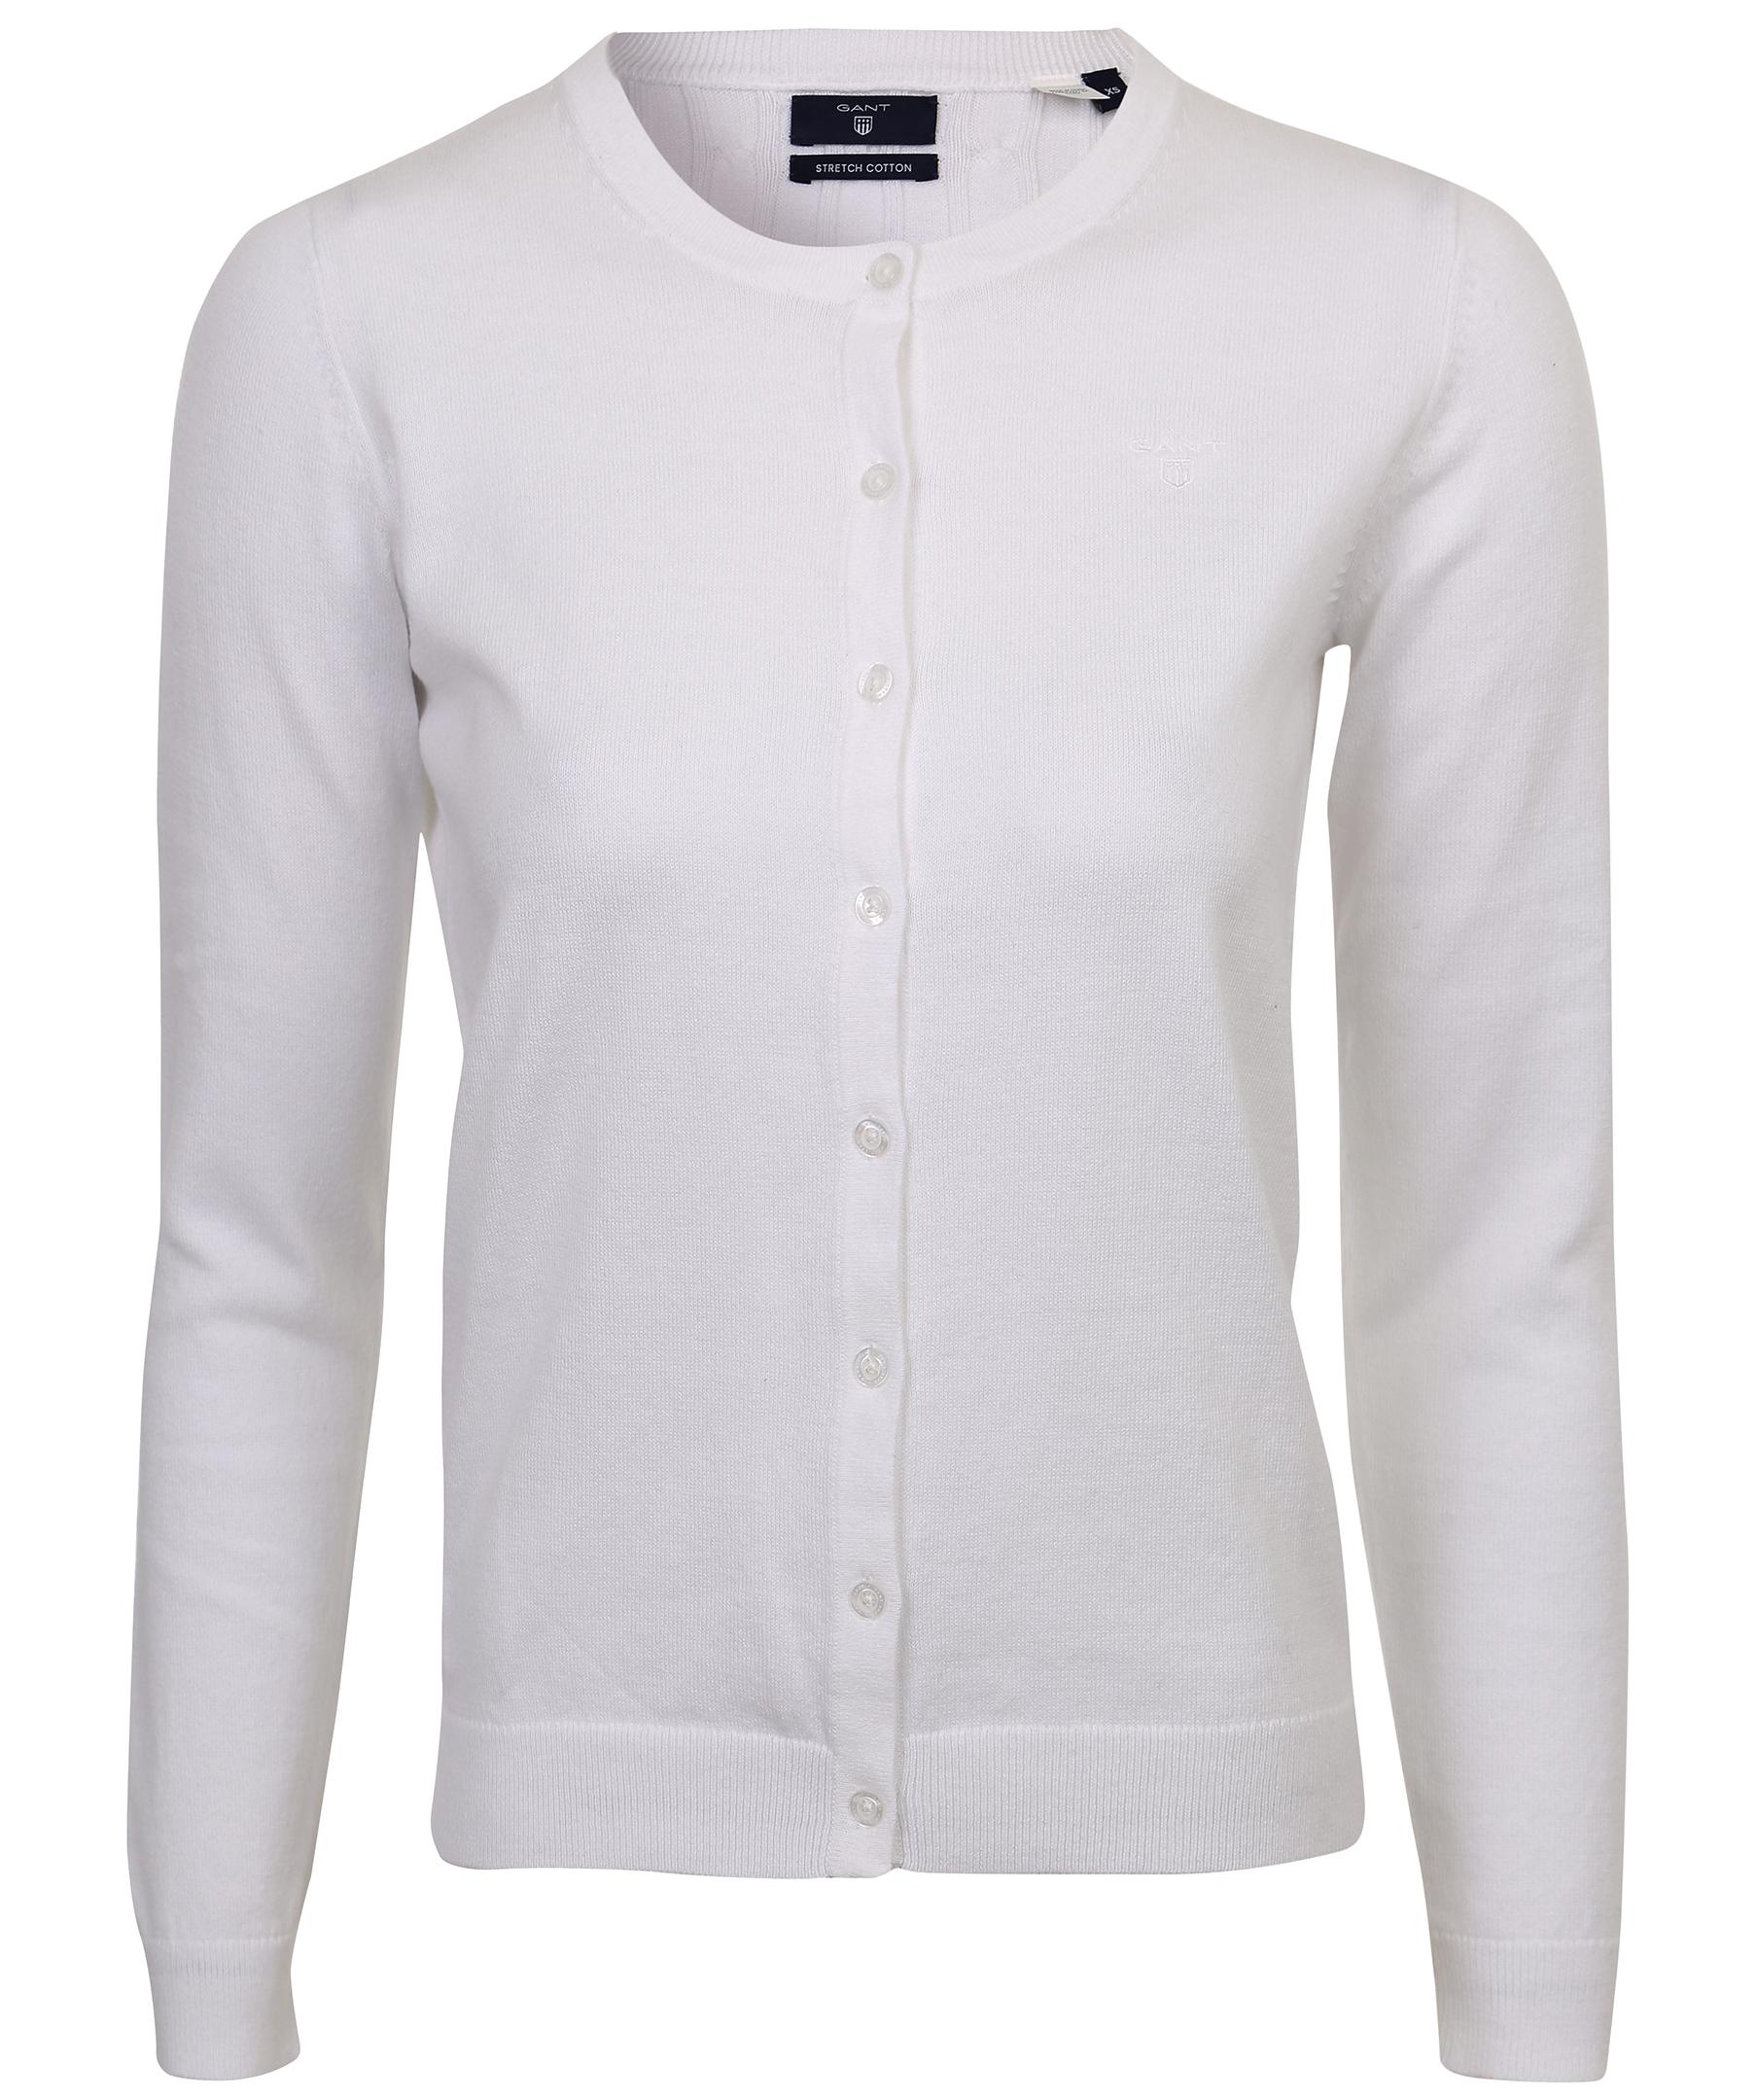 acda2d69866 Handla Gant Soft cotton crew cardigan hos Johnells.se